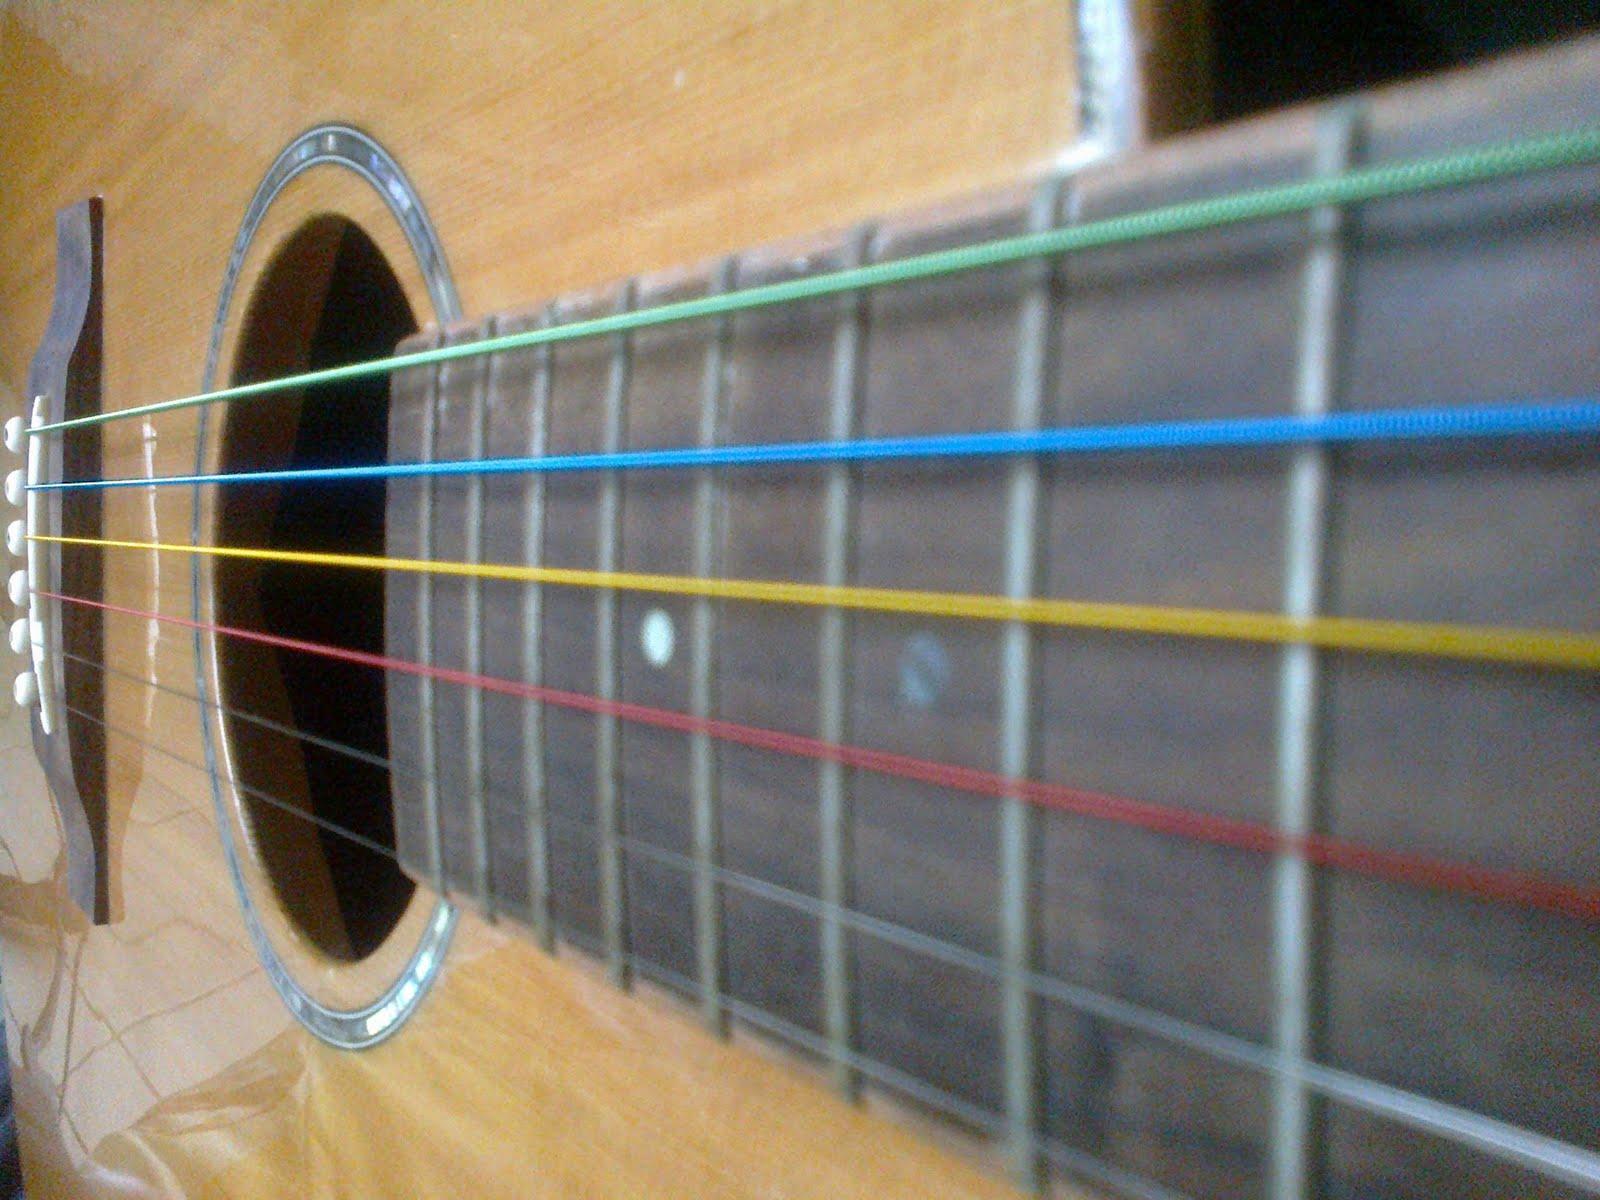 http://3.bp.blogspot.com/-5WEgETYffXY/TdJaaHEtt0I/AAAAAAAAAGE/MoA_l2HUNVg/s1600/rainbow+strings.jpg